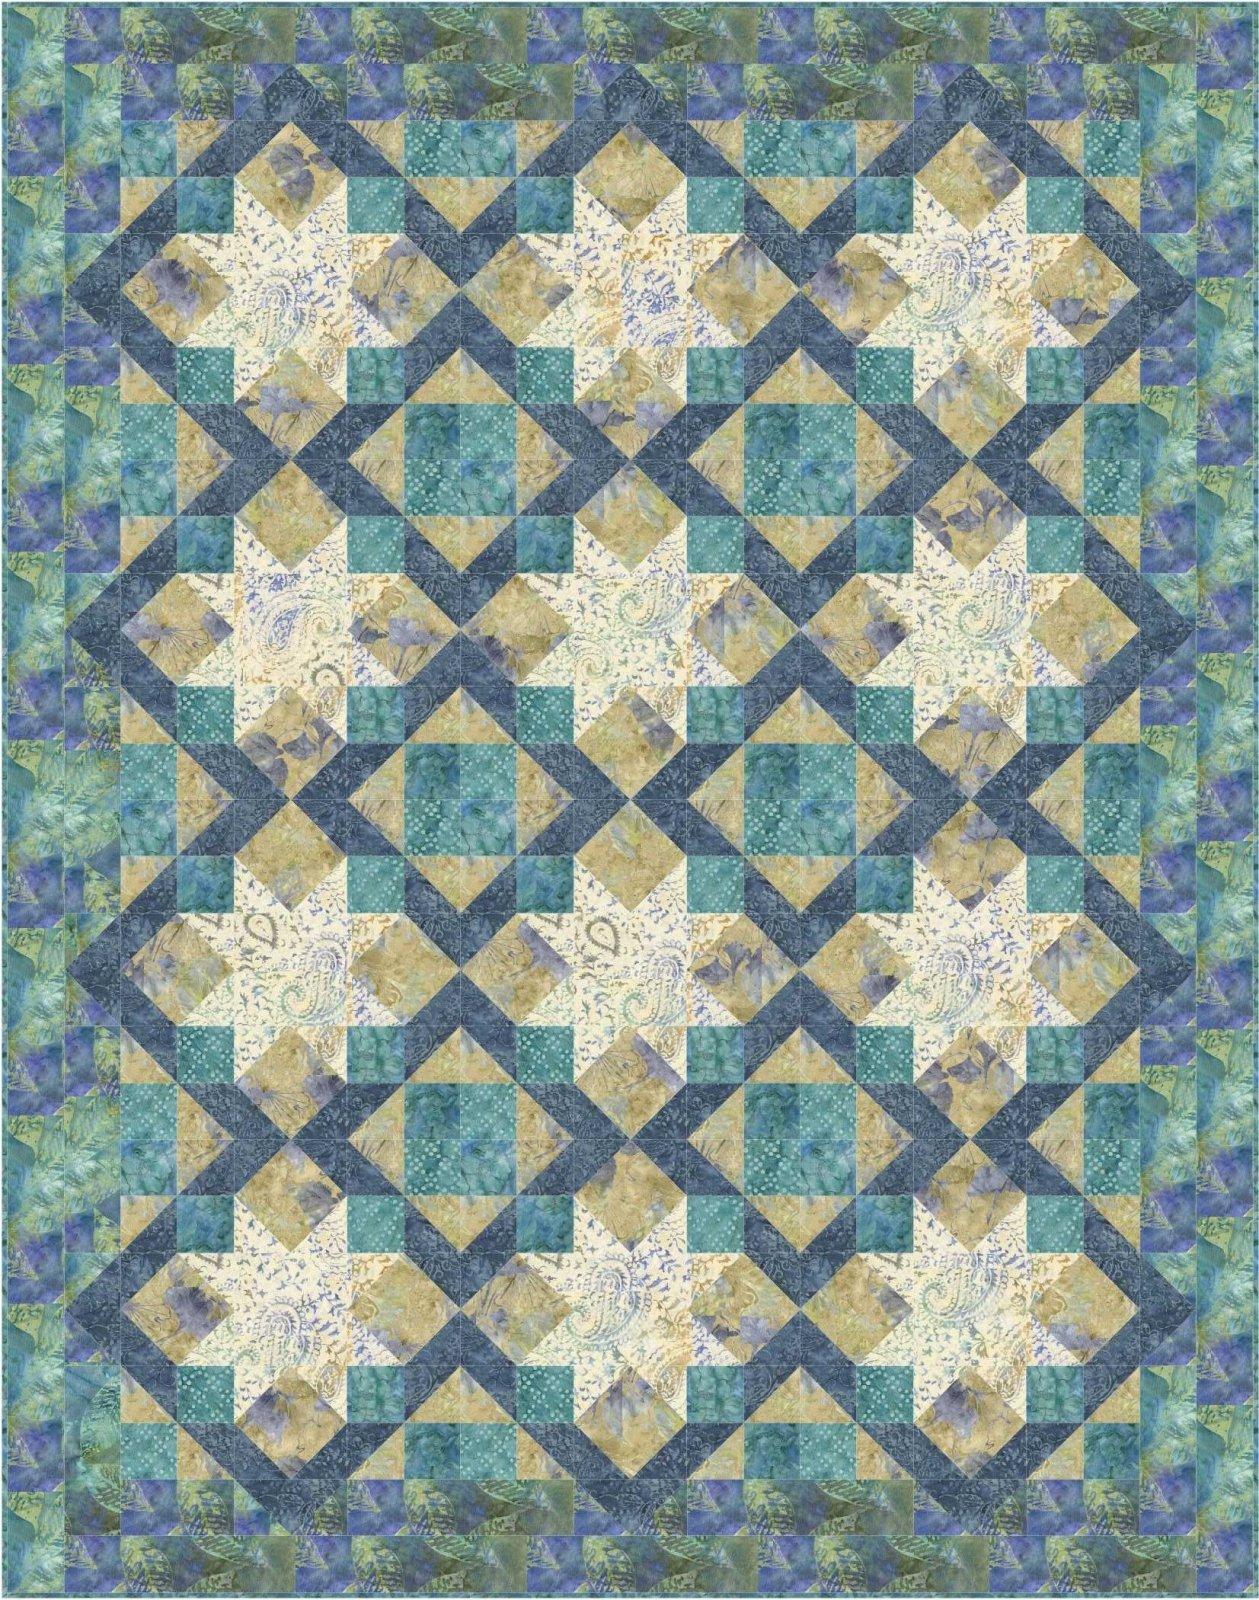 Starshine pattern